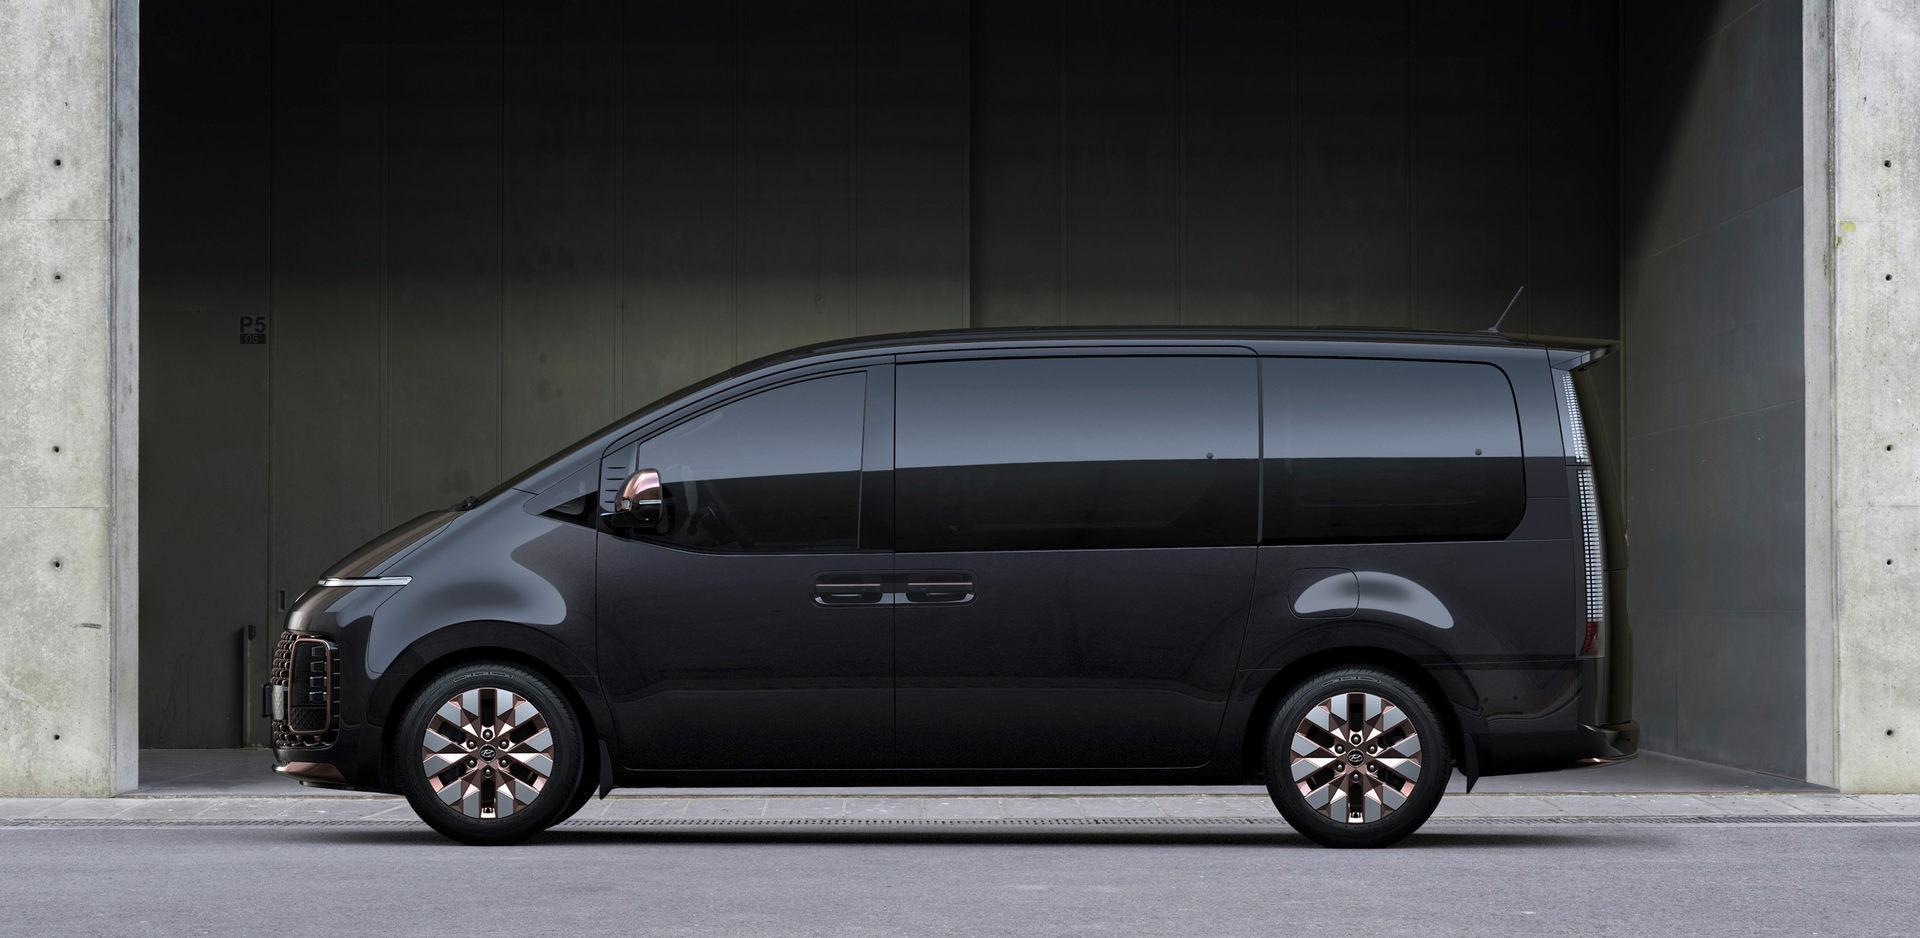 Hyundai-Staria-7 (1).jpg